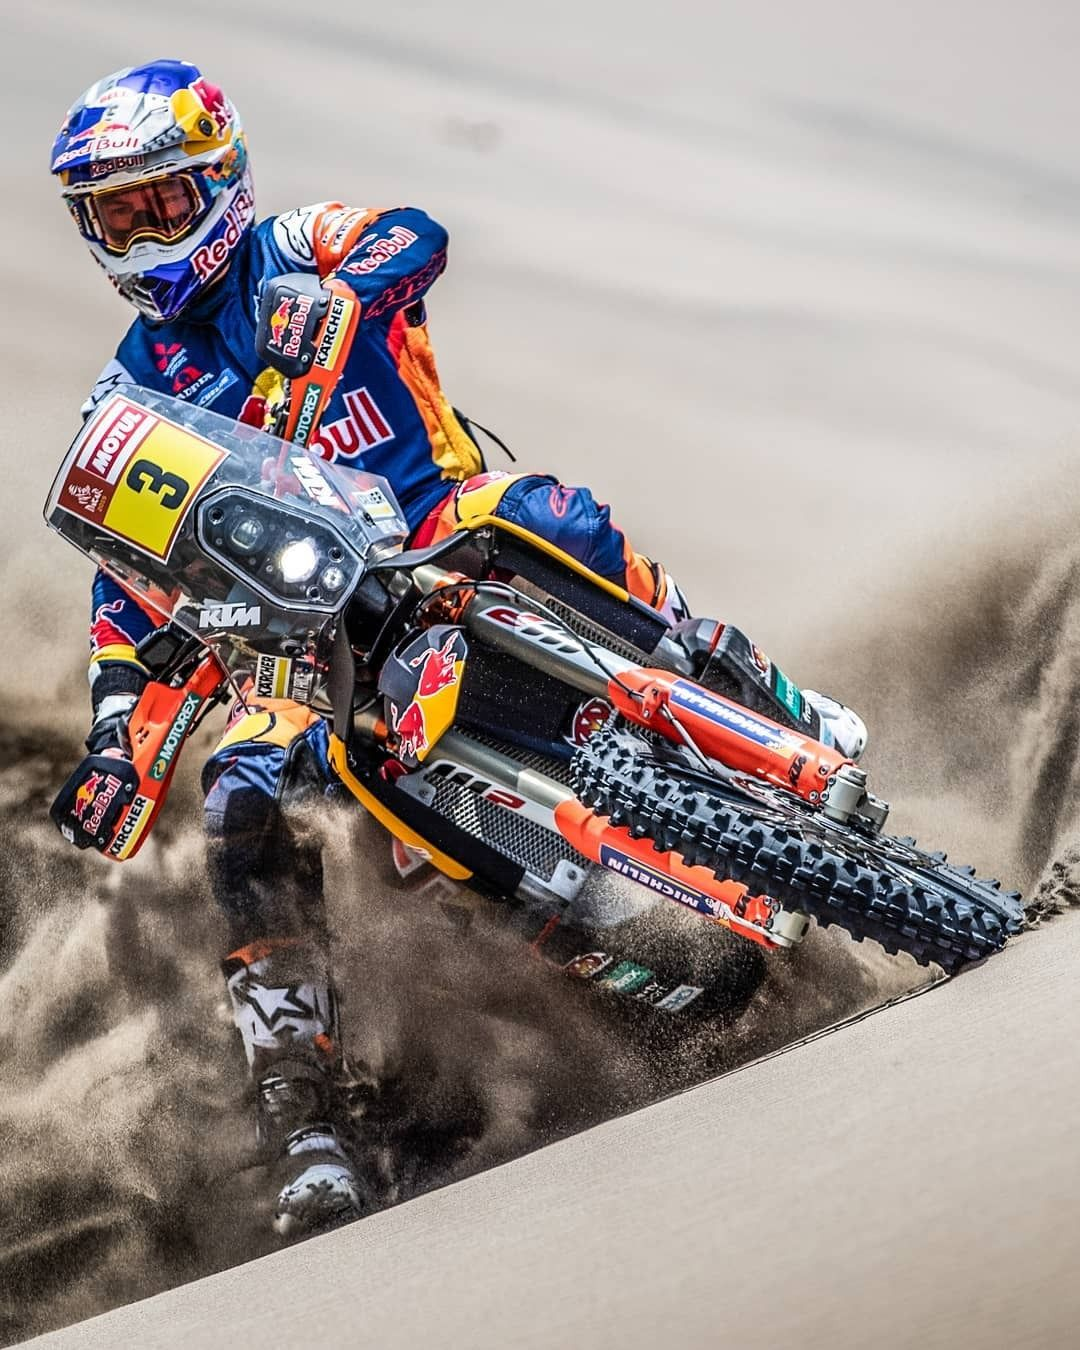 2019 Dakar Rally Champion Tobyprice87 Ktm 450 Rally Catch